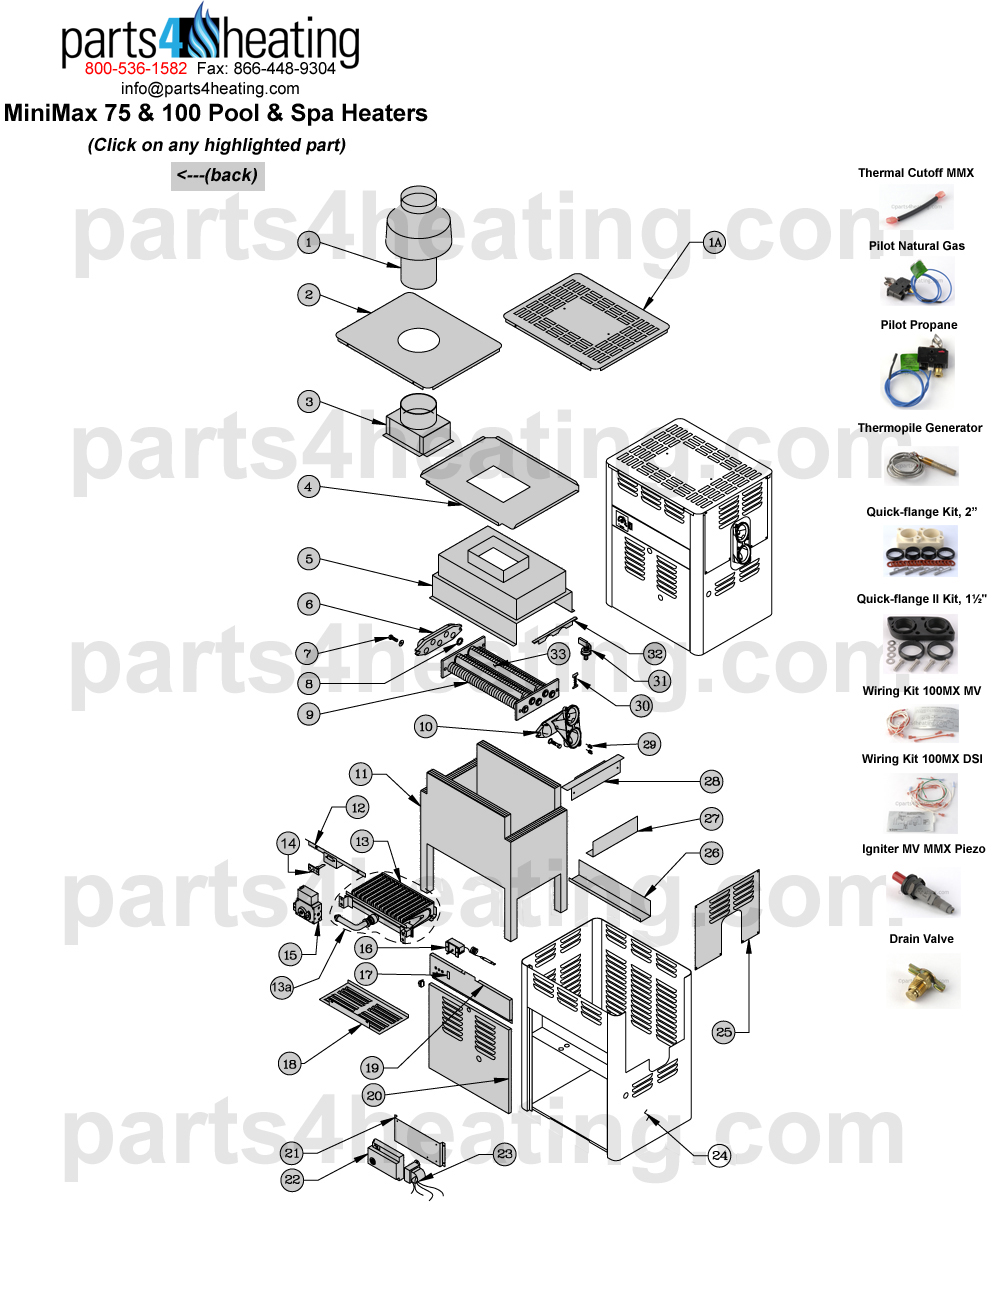 sta rite pool pump wiring diagram mg midget 1500 light installation - imageresizertool.com